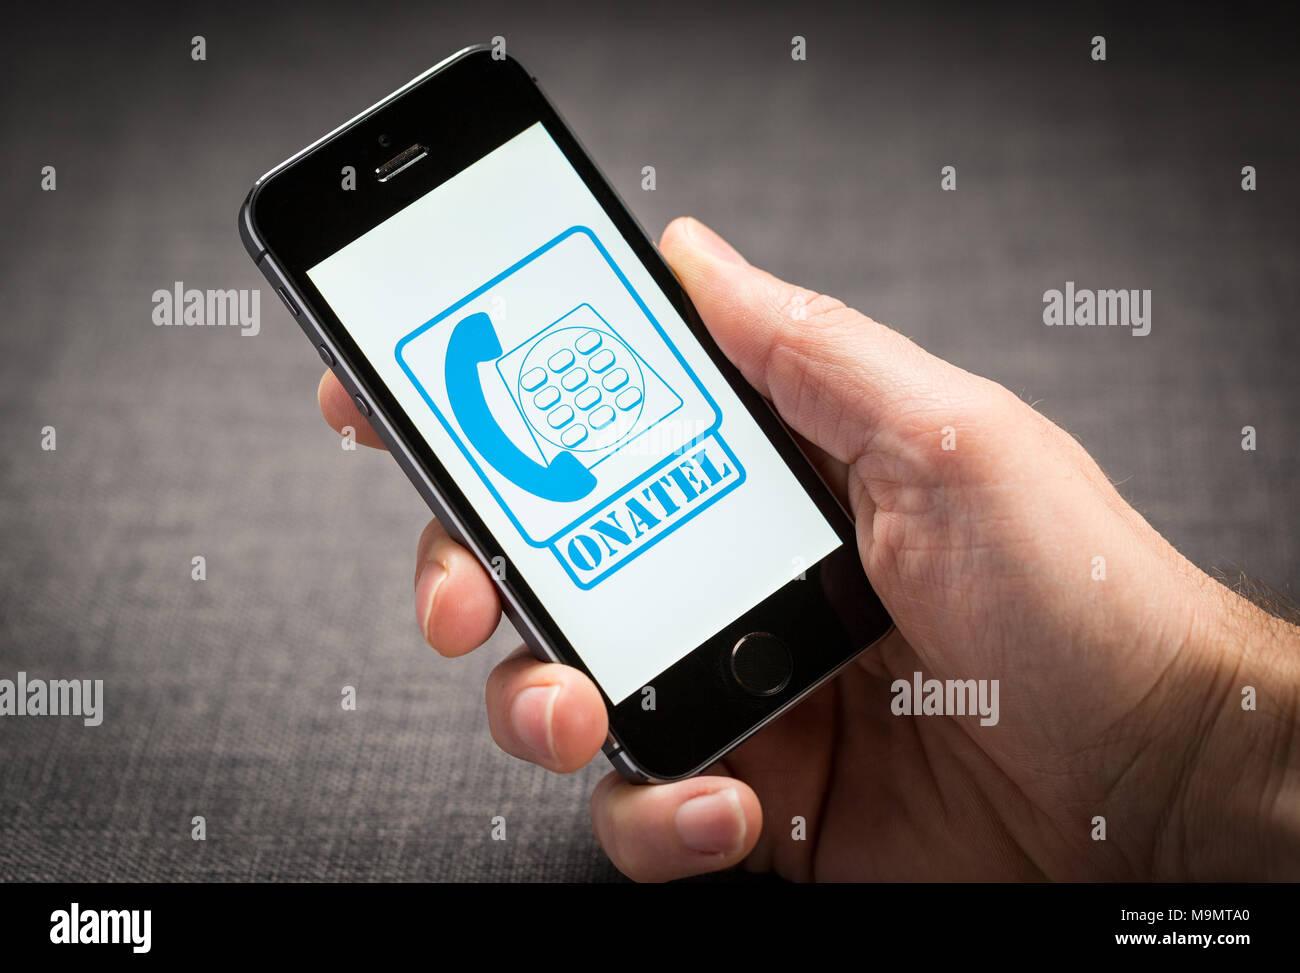 Onatel Telecommunications company on an iPhone - Stock Image